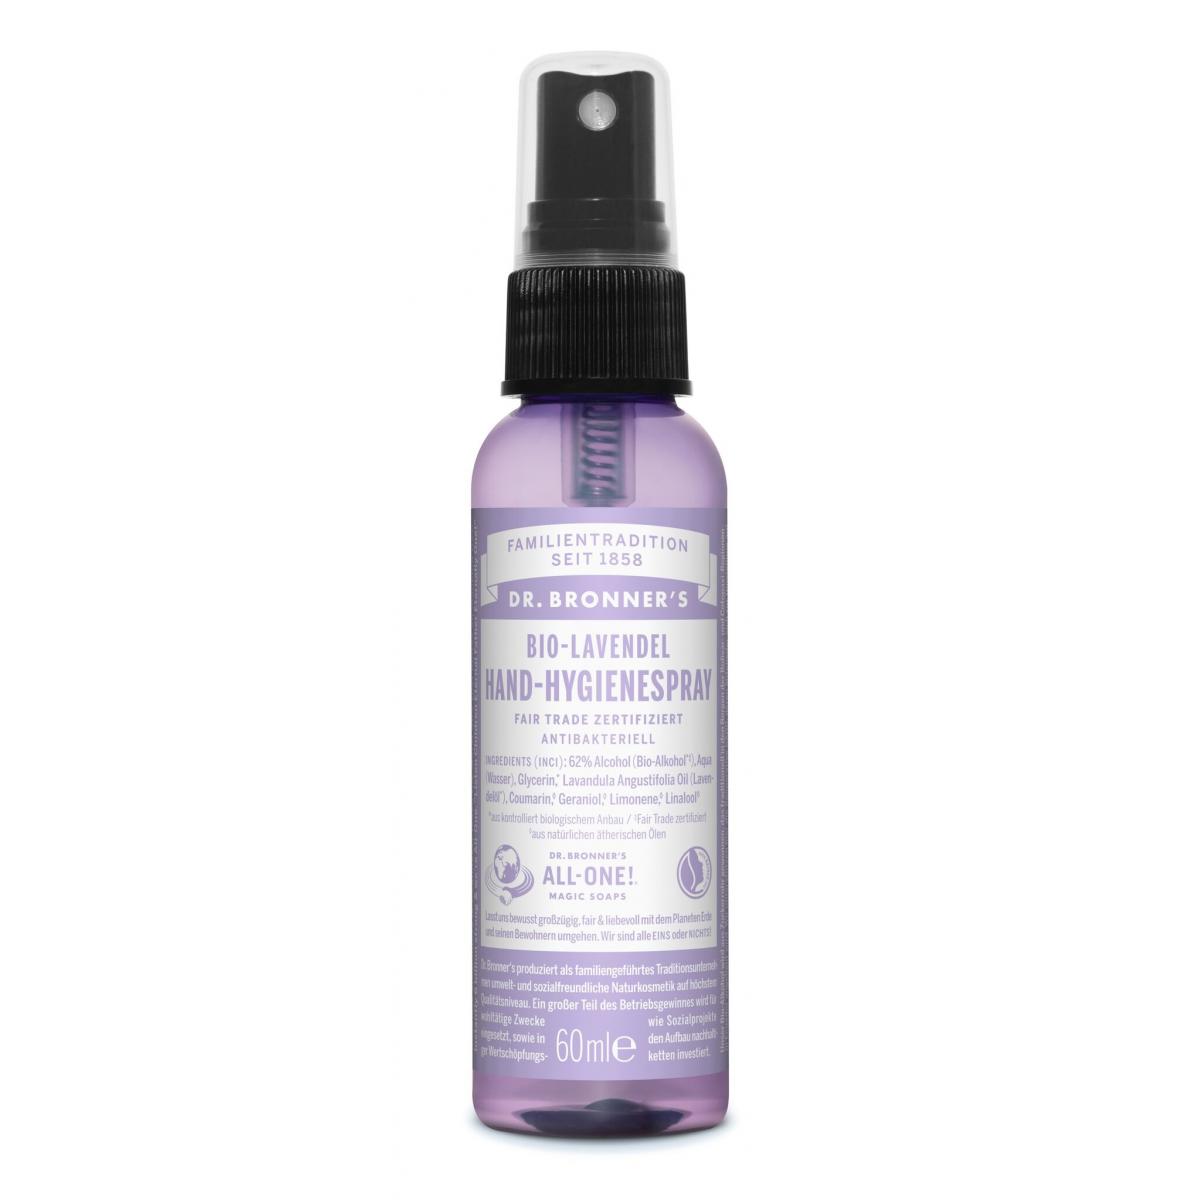 Hand-Hygienespray Lavendel